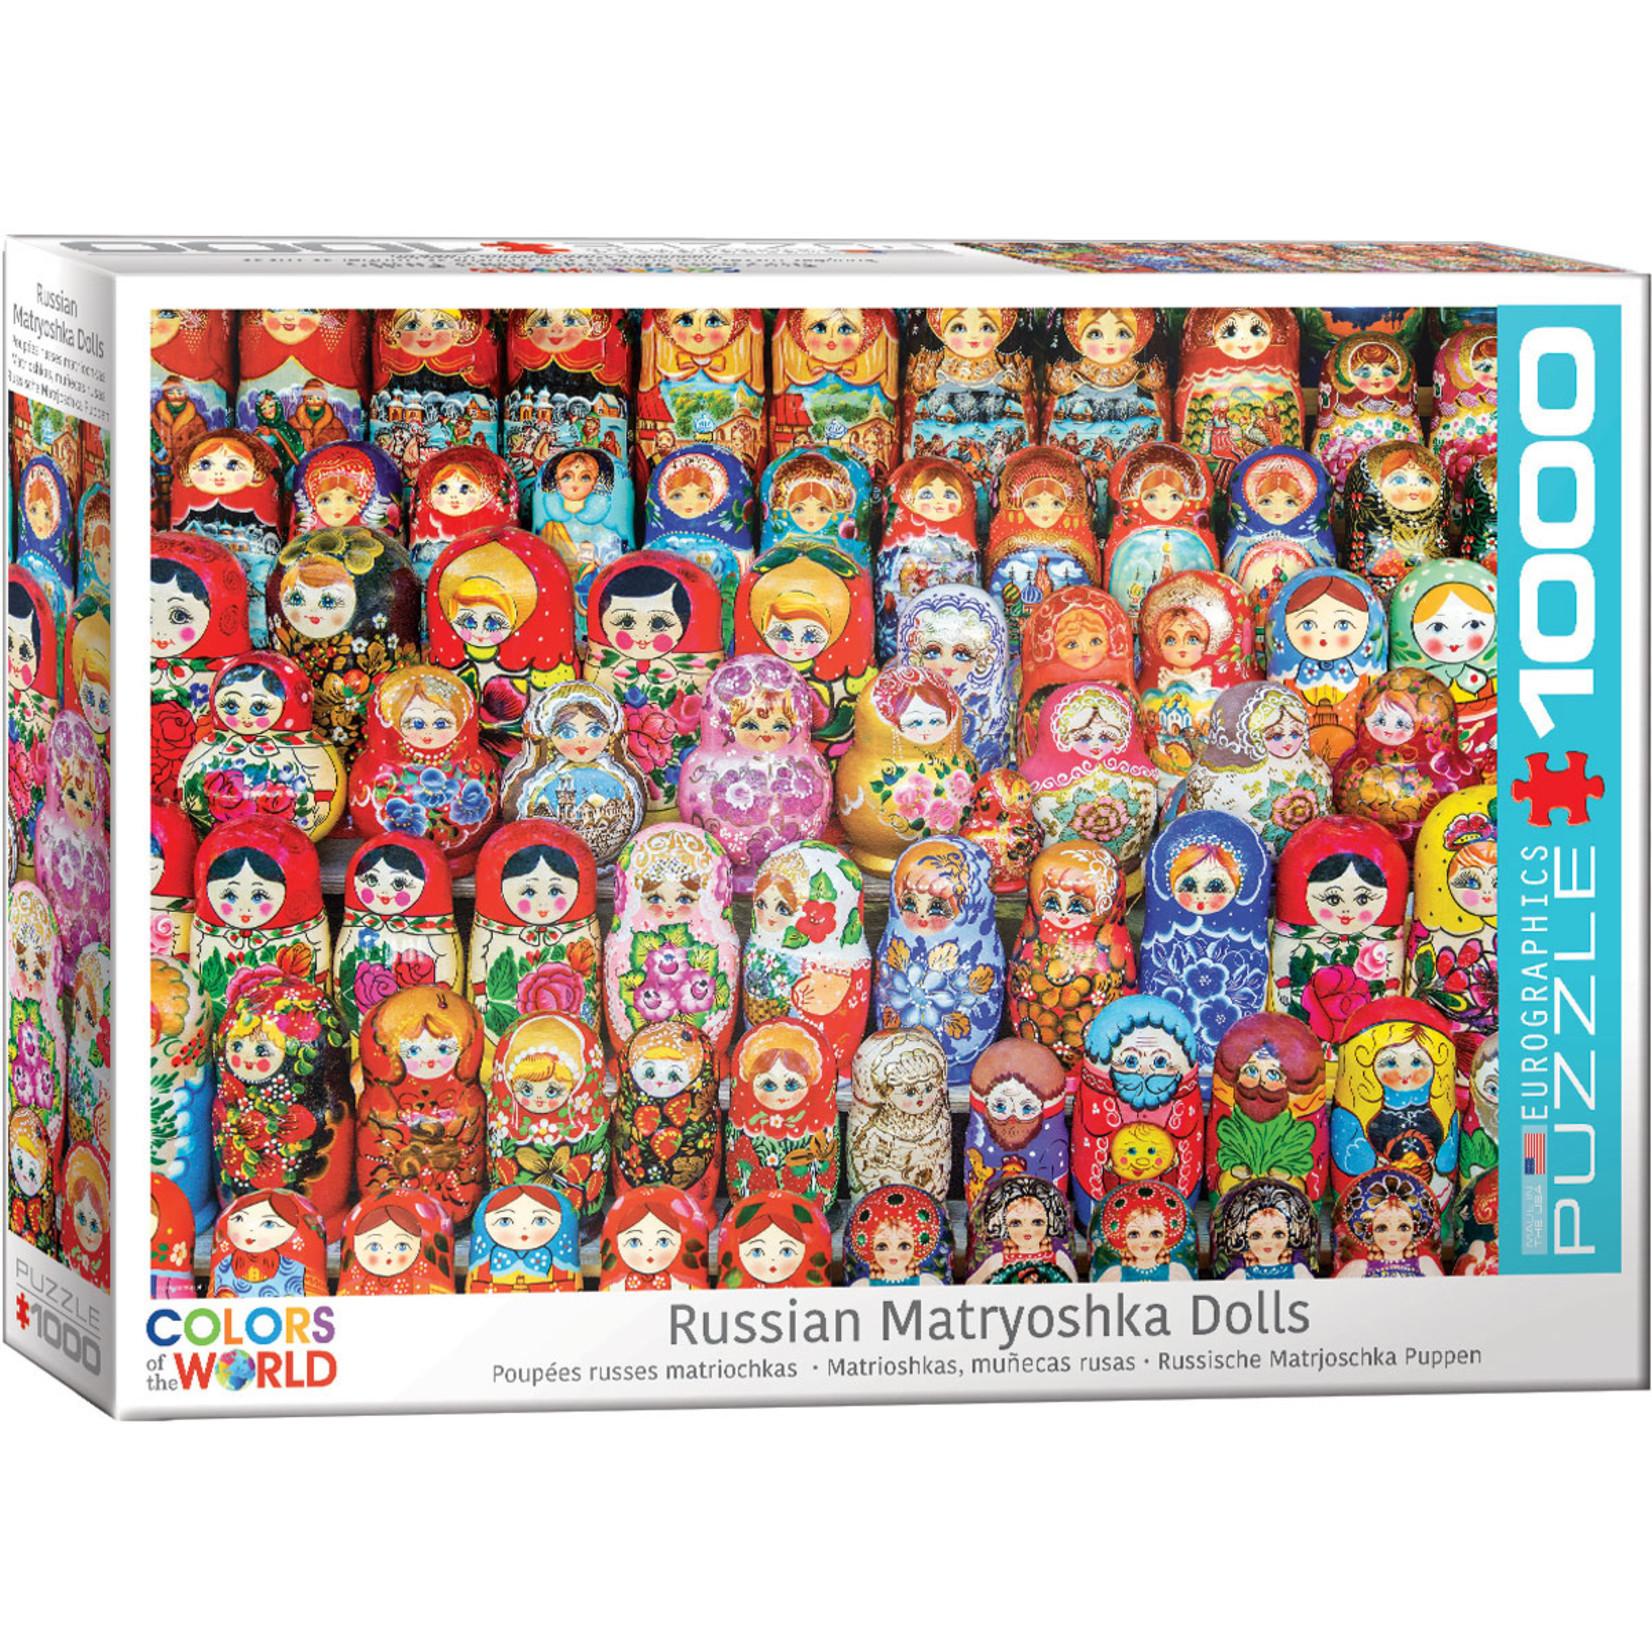 EuroGraphics Puzzles Russian Matryoshka Dolls 1000pc